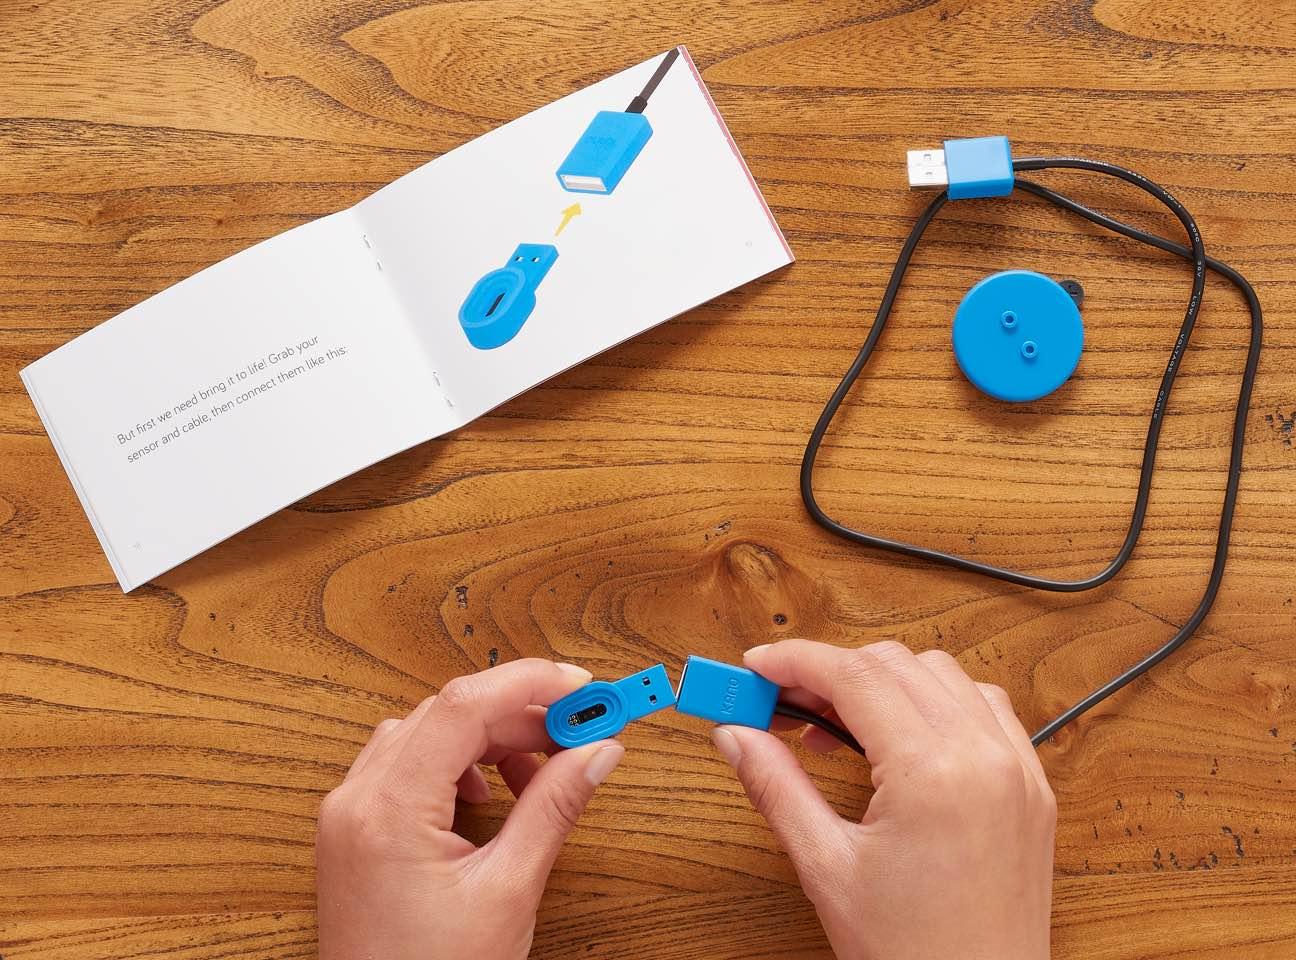 Build the motion sensor